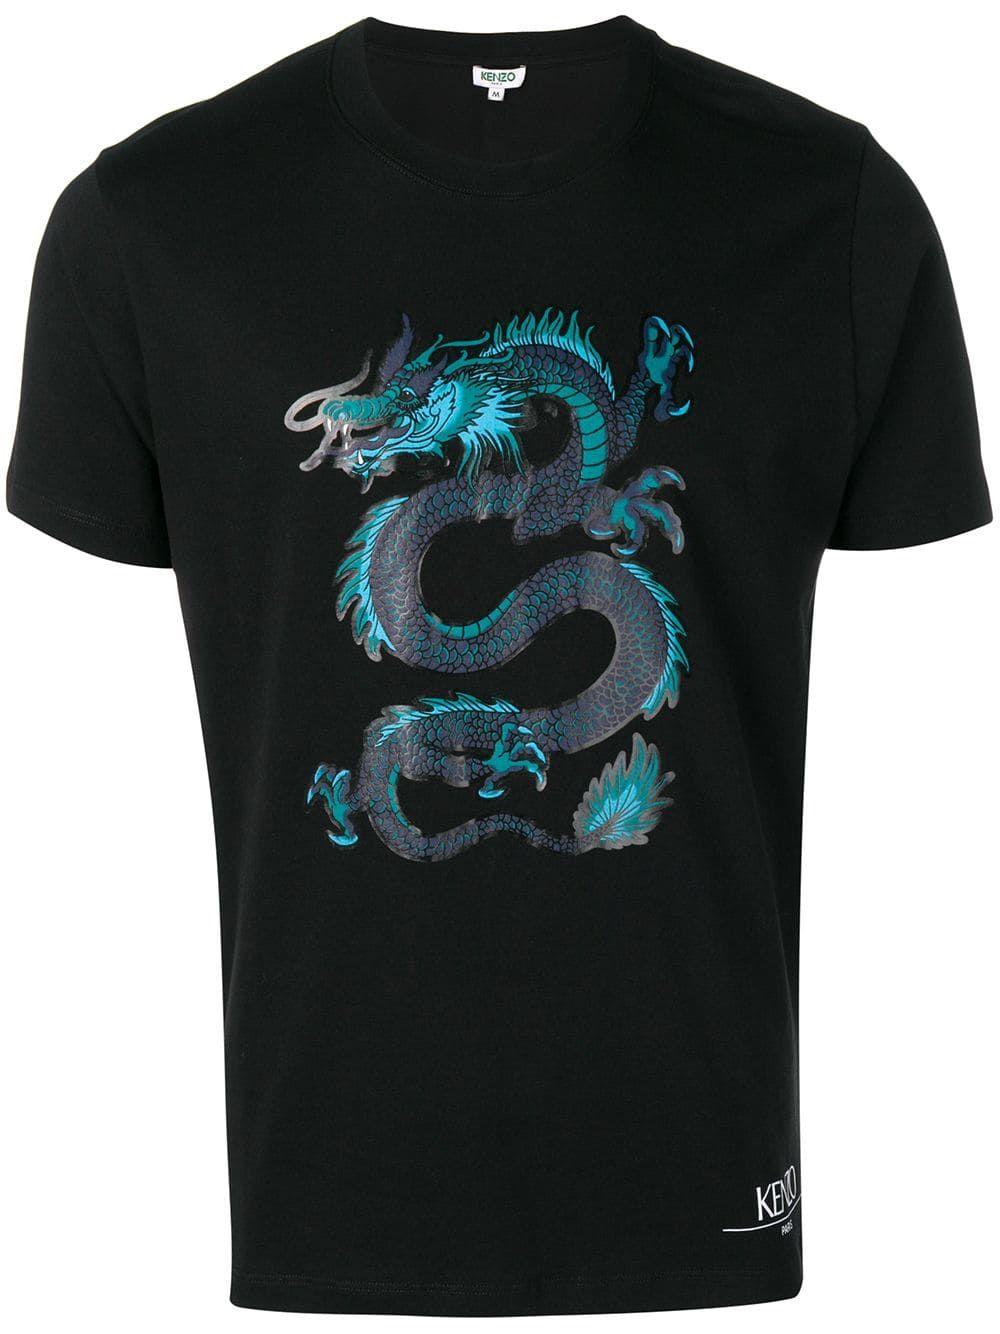 c641da594 KENZO KENZO DRAGON PRINT T-SHIRT - BLACK. #kenzo #cloth | Kenzo in ...